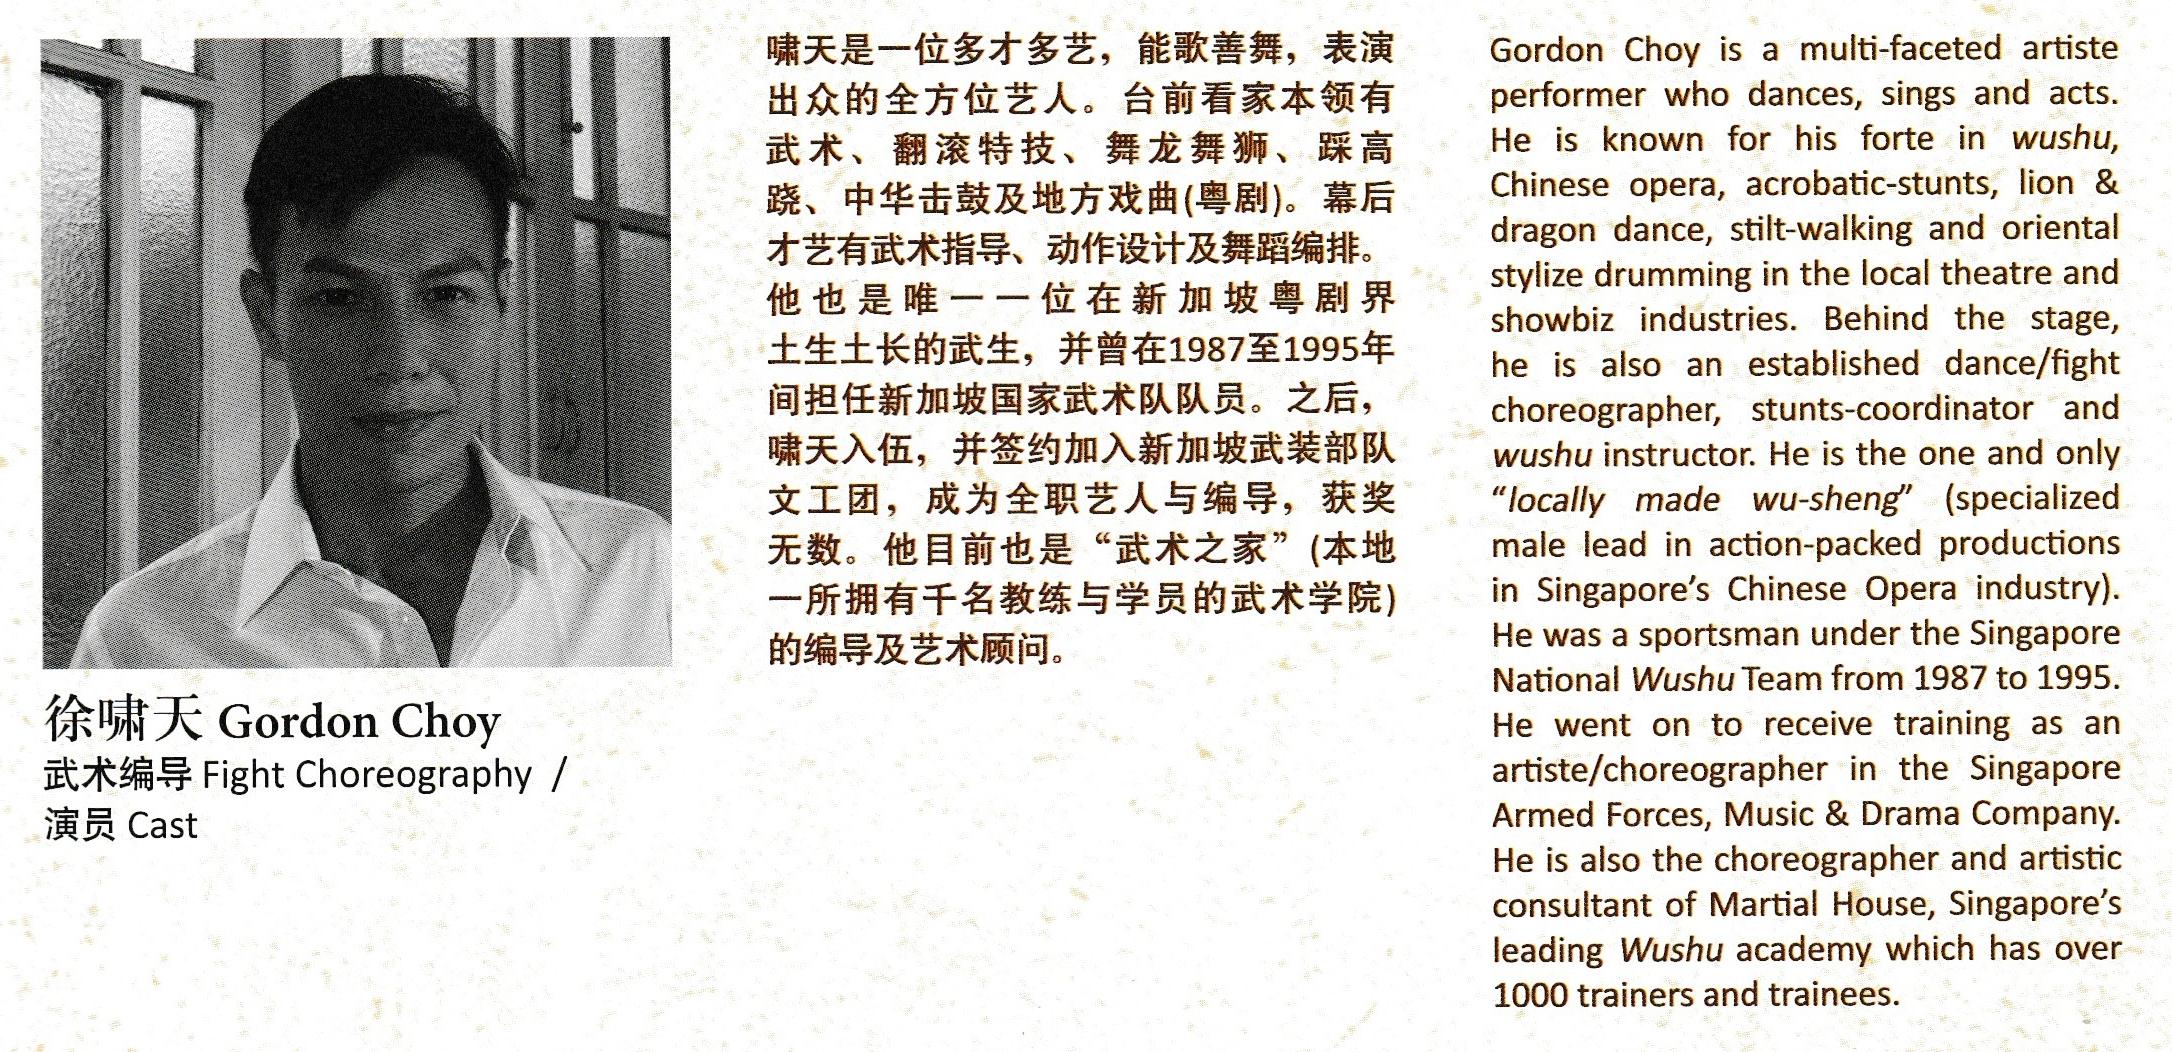 Gordon Choy